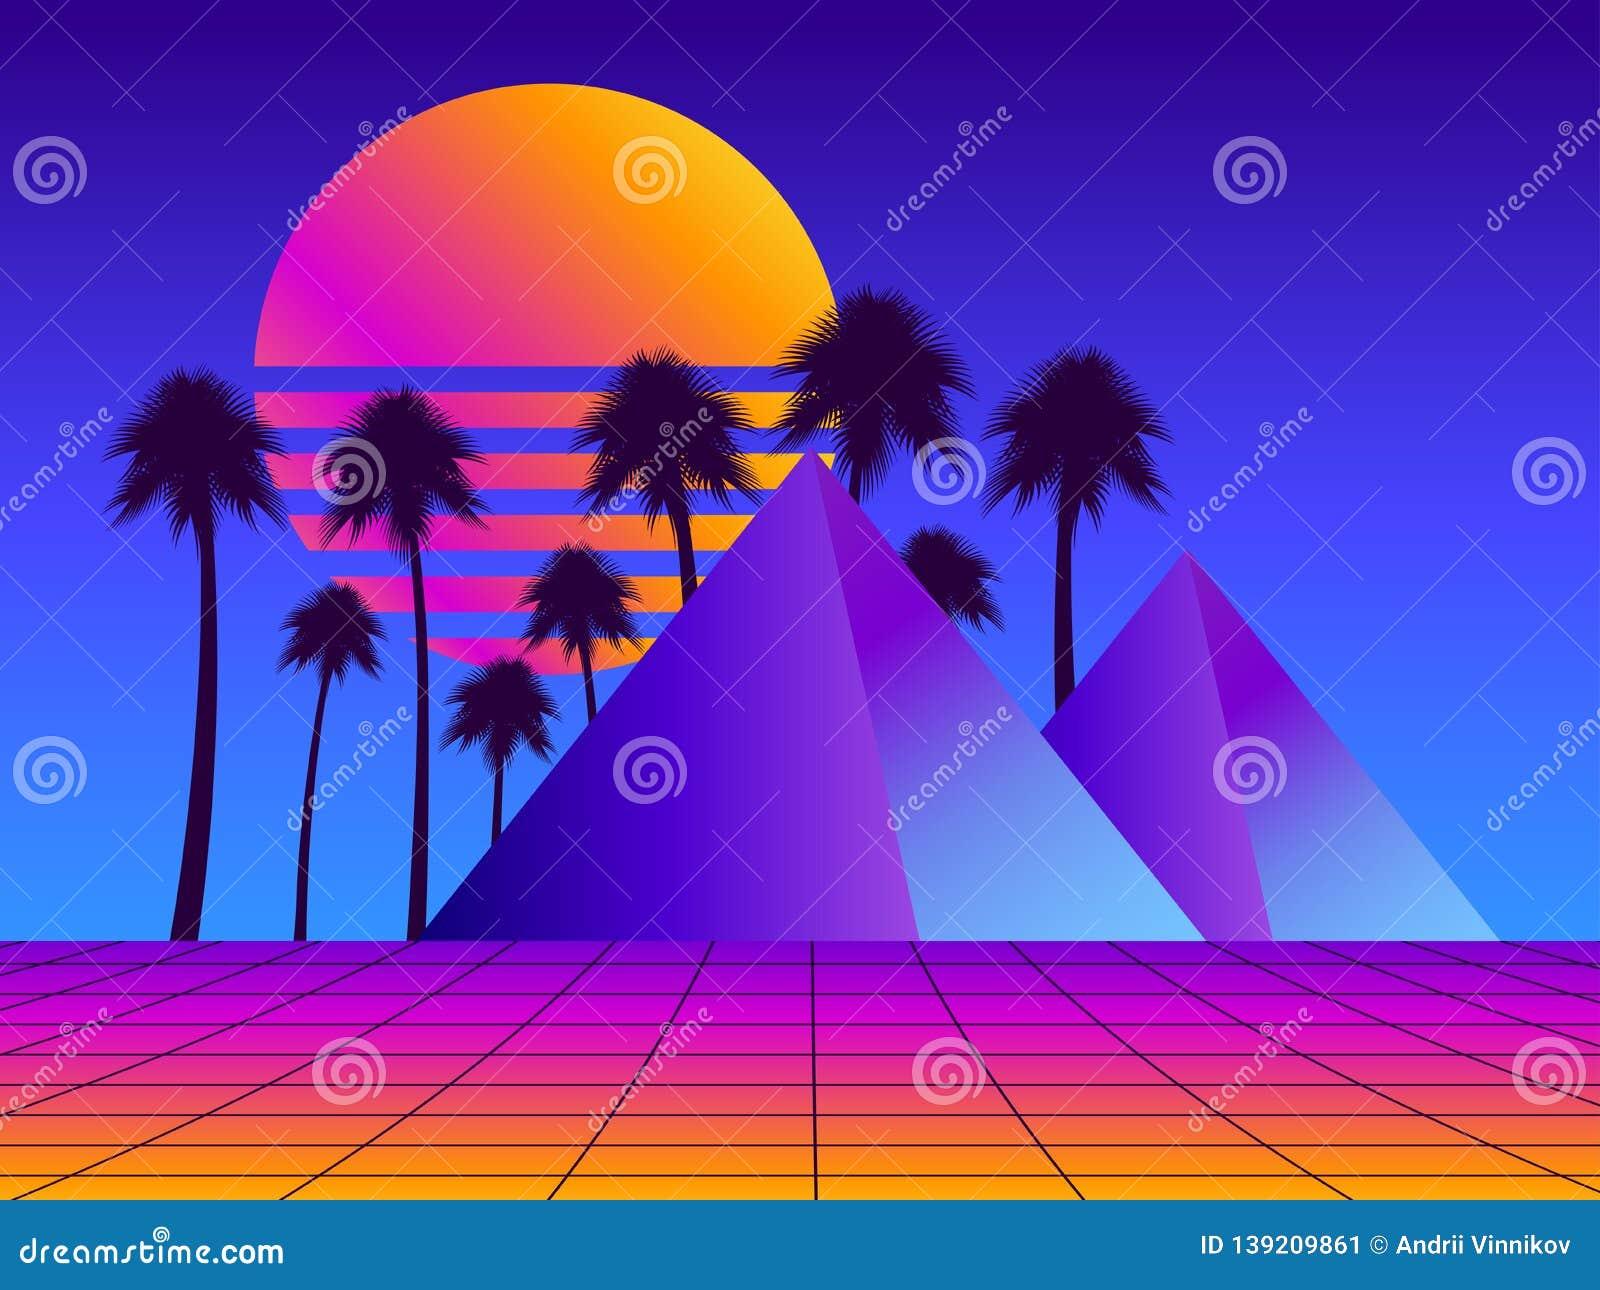 retro futurism pyramids palm trees perspective grid neon sunset synthwave retro background retrowave vector retro futurism 139209861